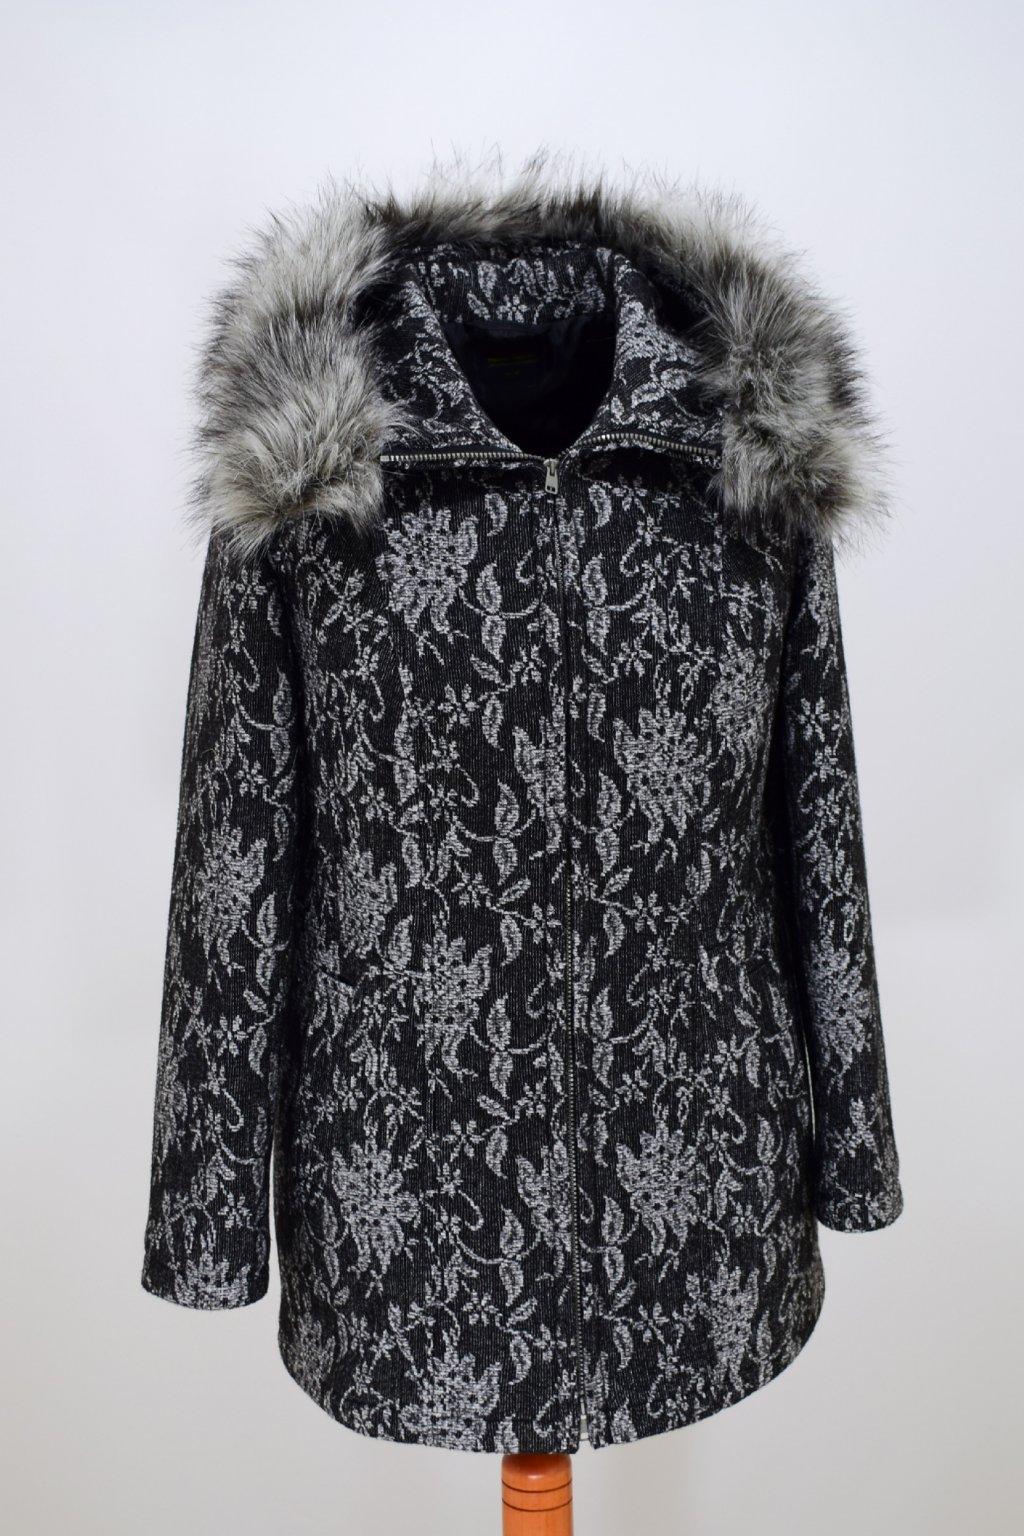 Dámský černošedý zimní kabátek Žaneta vzor nadměrné velikosti.